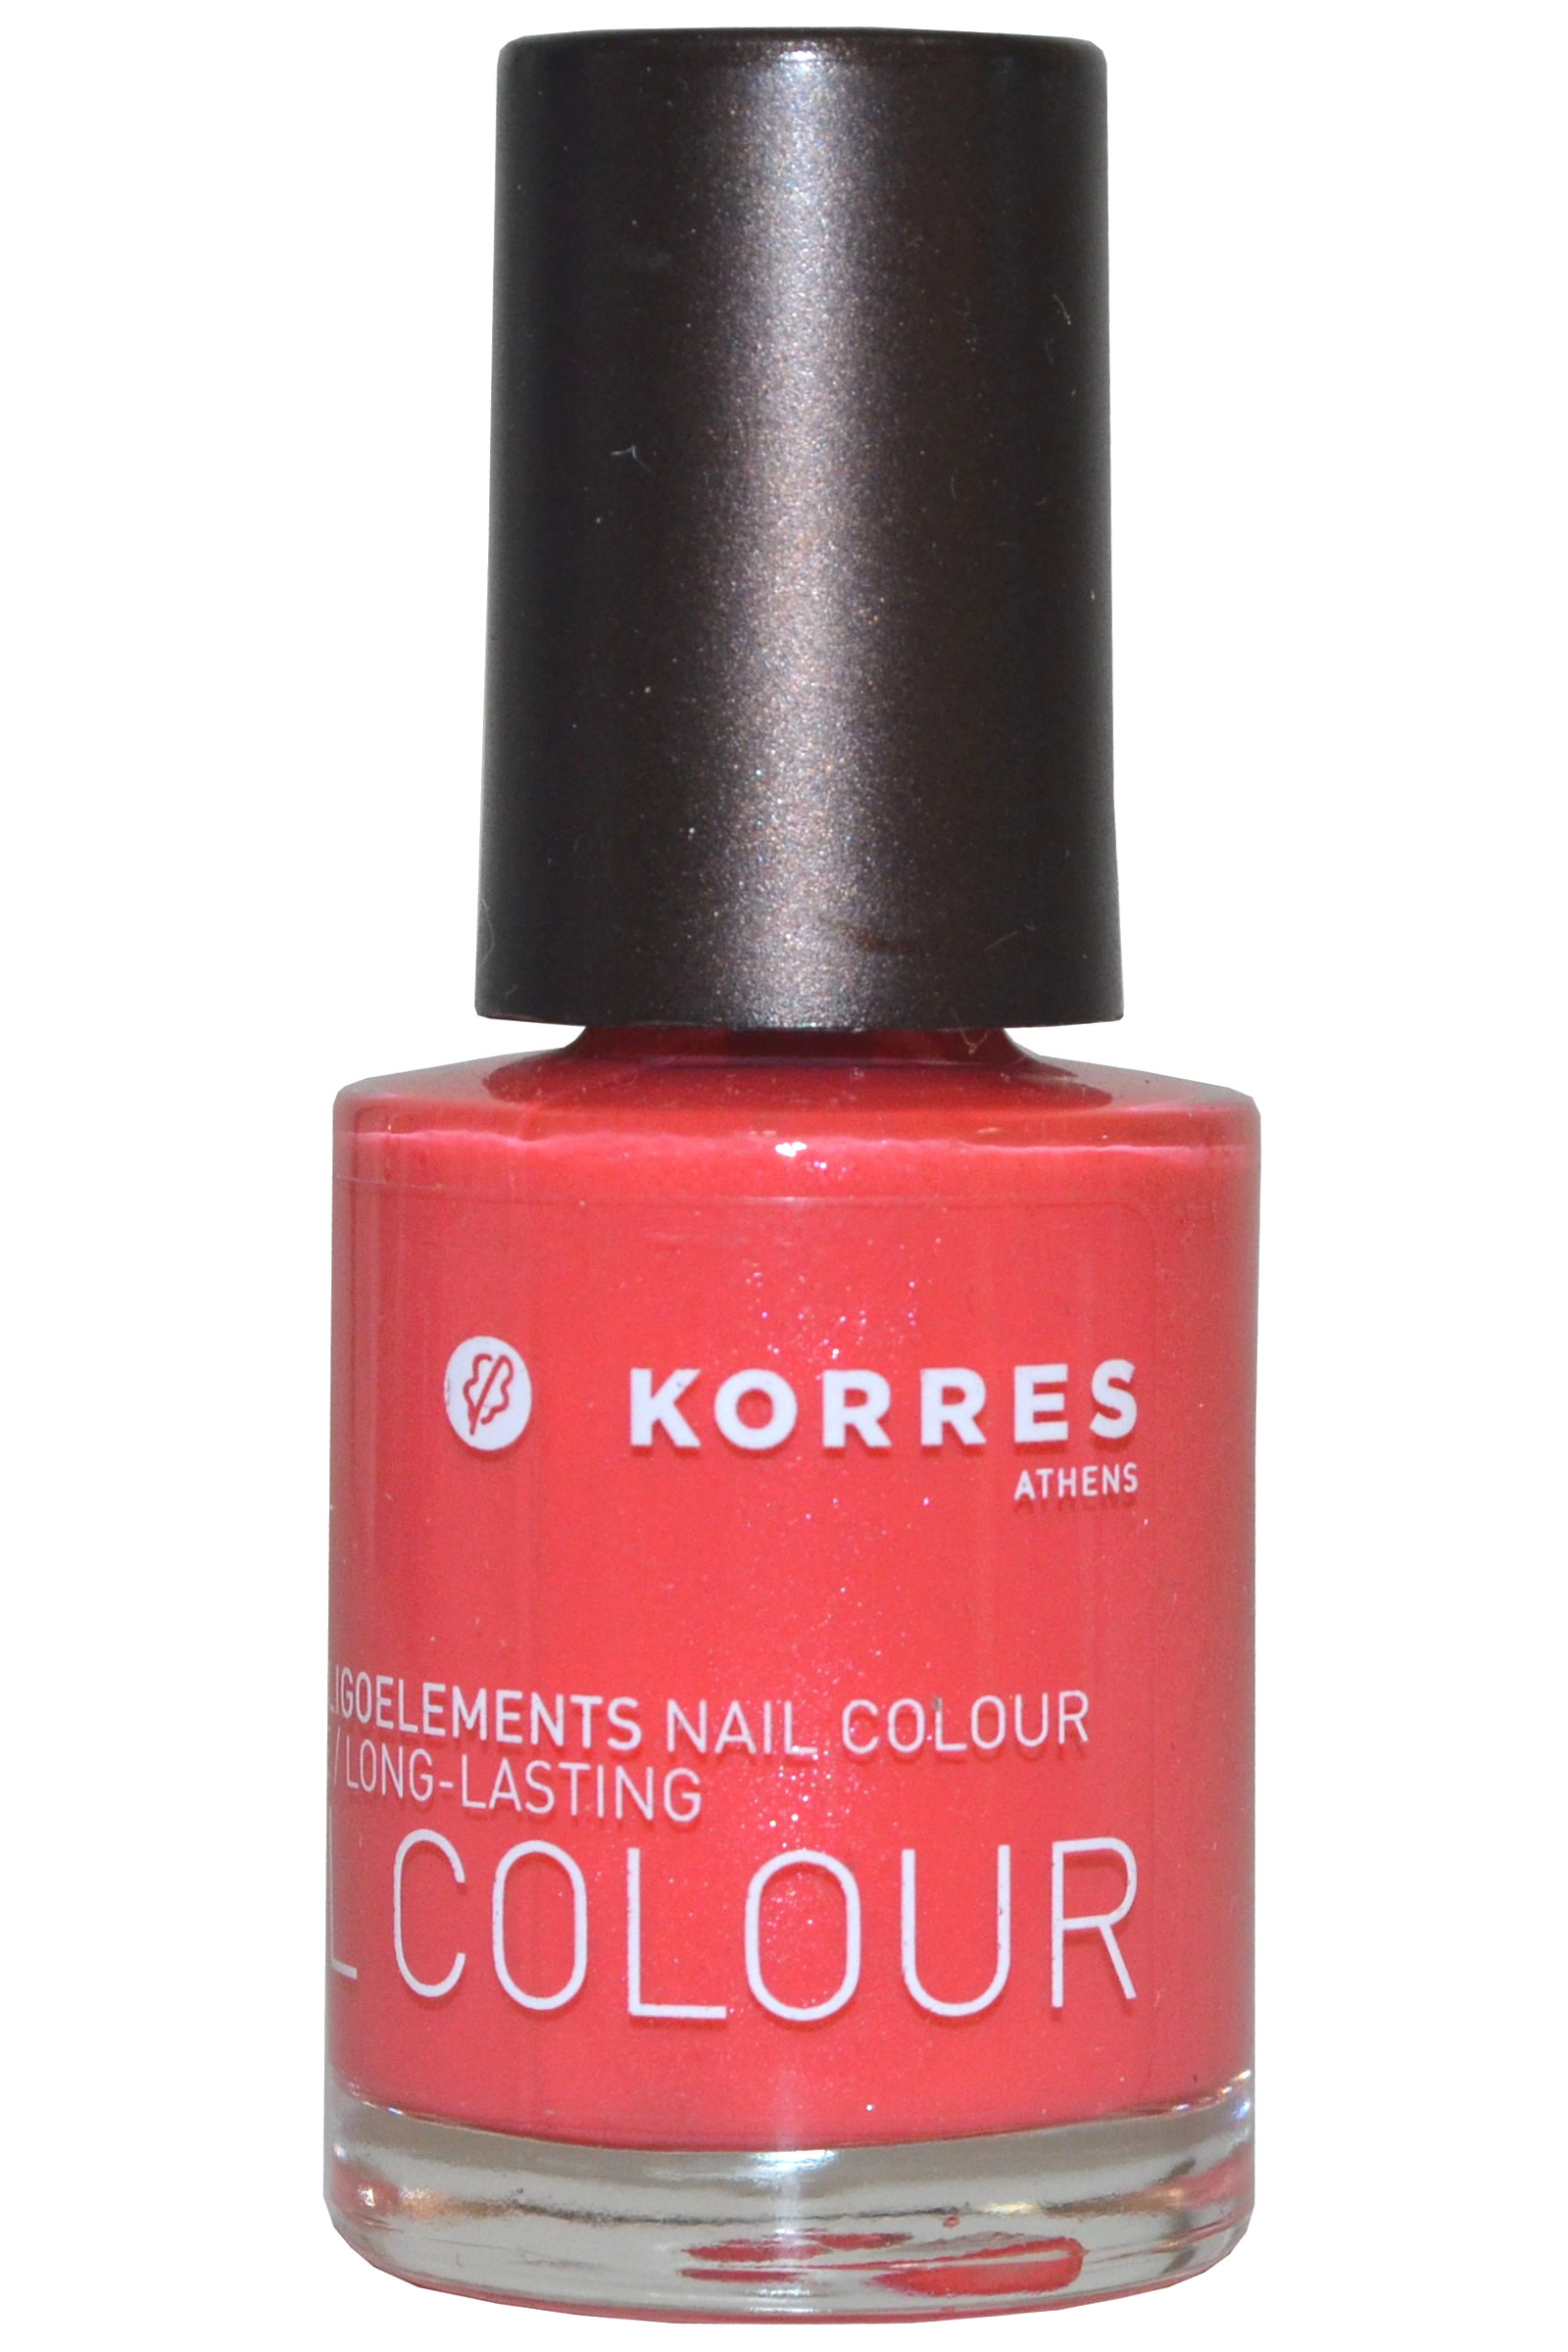 Korres Nail Color High Shine Long Lasting 10ml Grenadine Pink (#49) [7-Free]